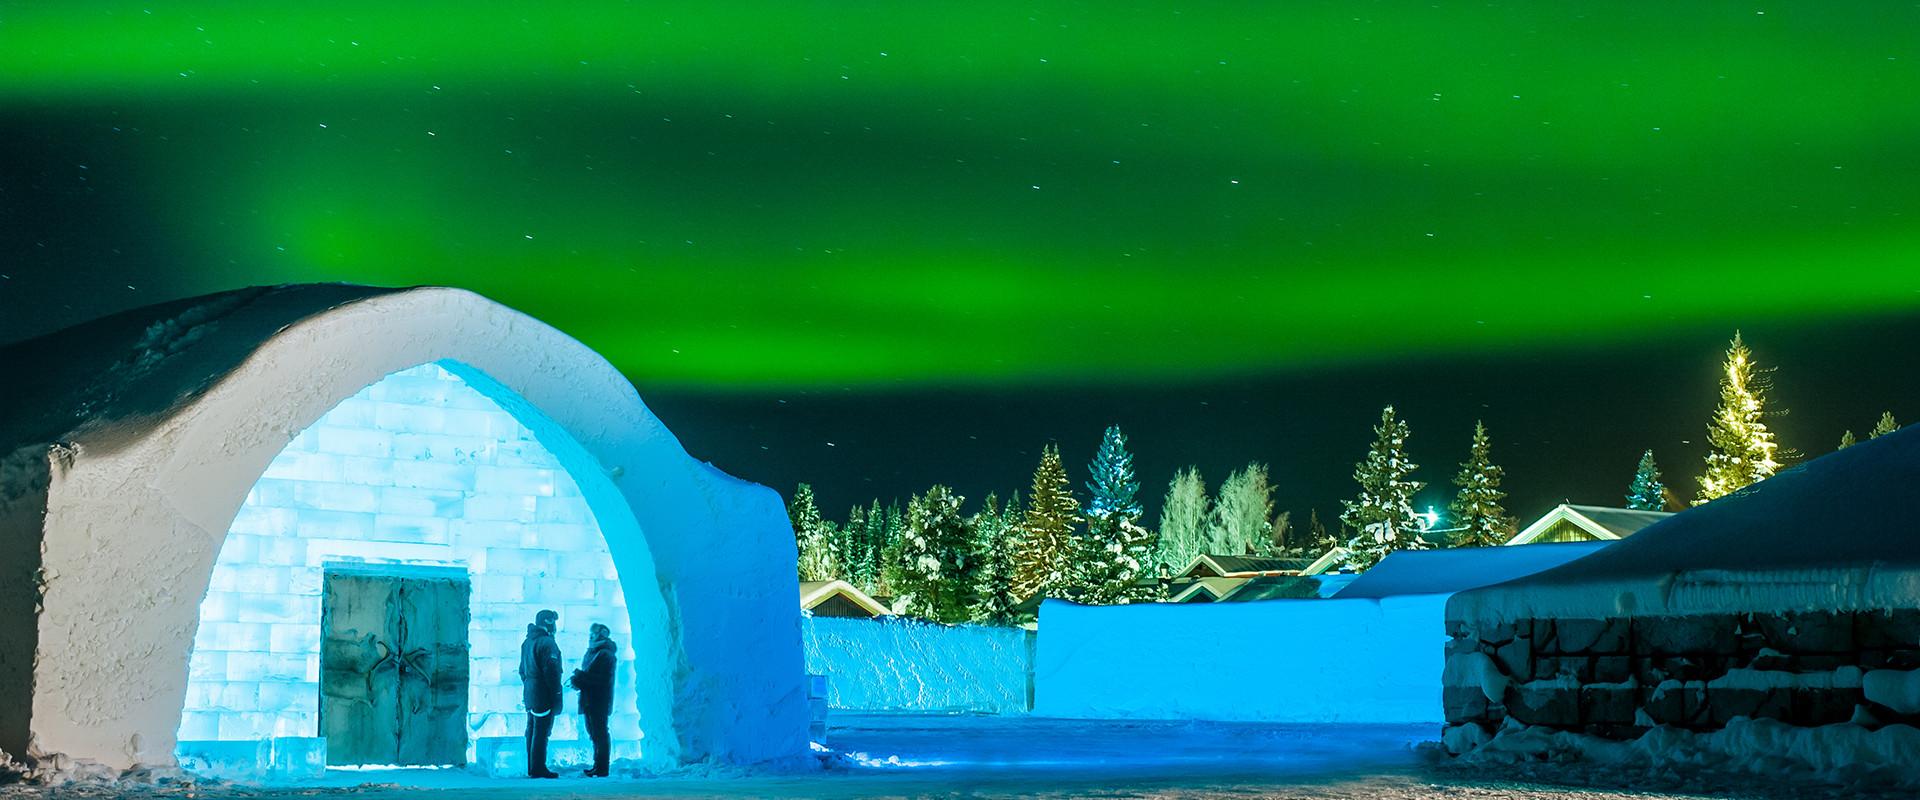 Northern Lights over the Icehotel, Sweden,Yukkasjärvi